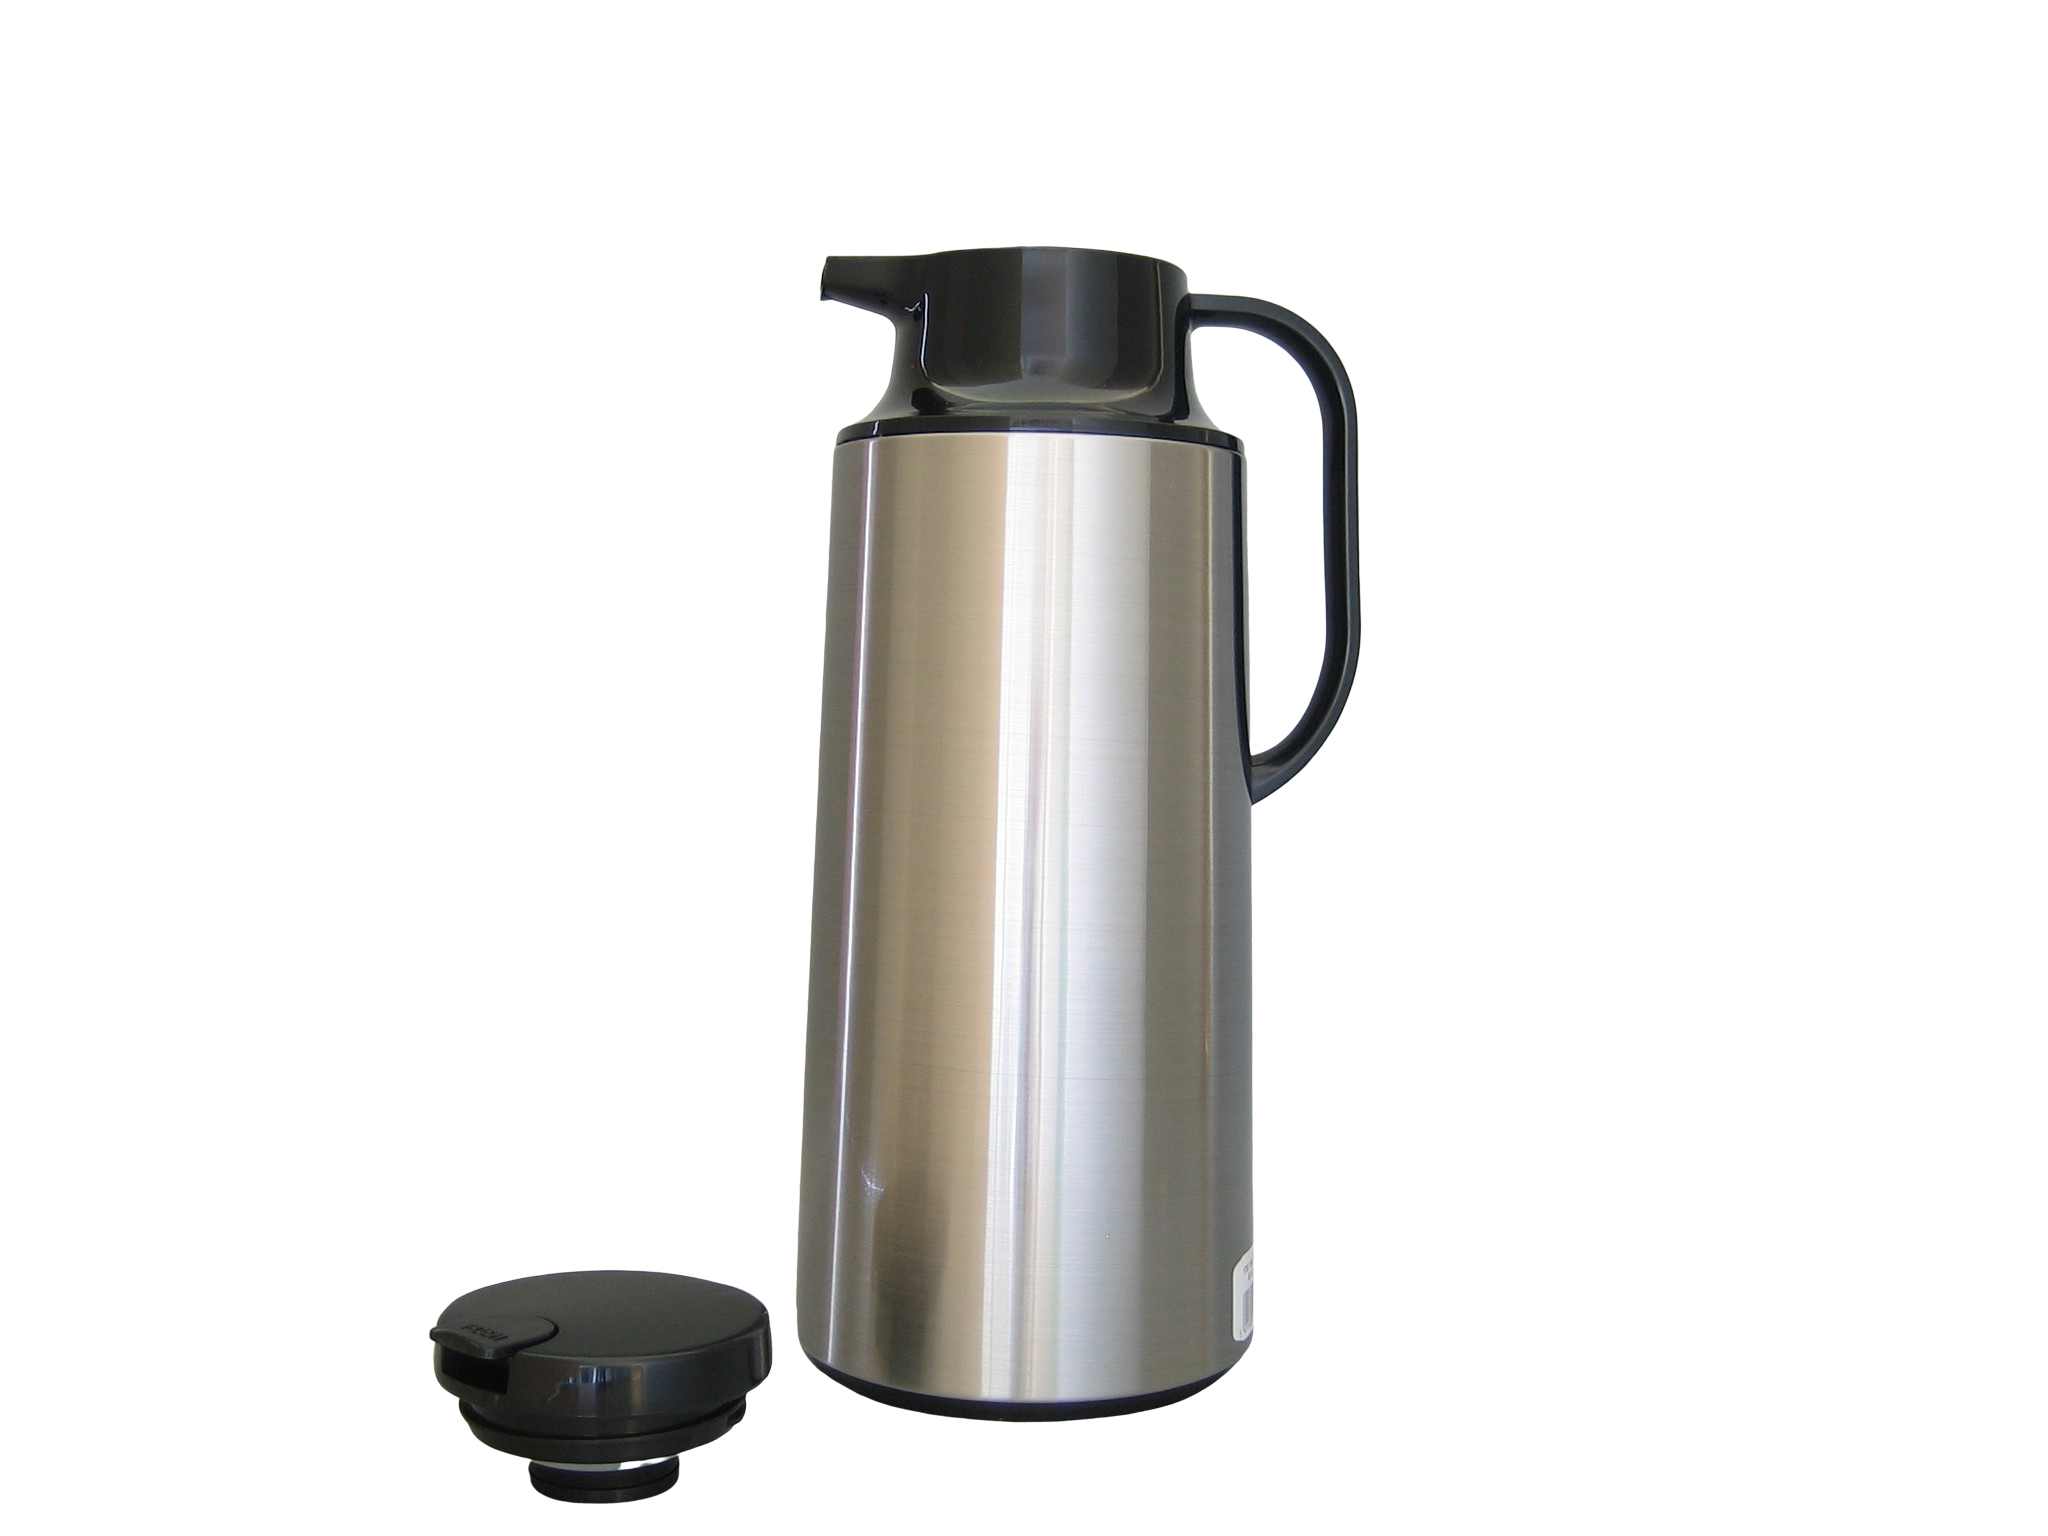 HUS191 - Pichet isotherme inox 1.90 L (ALLGO) - Allgo